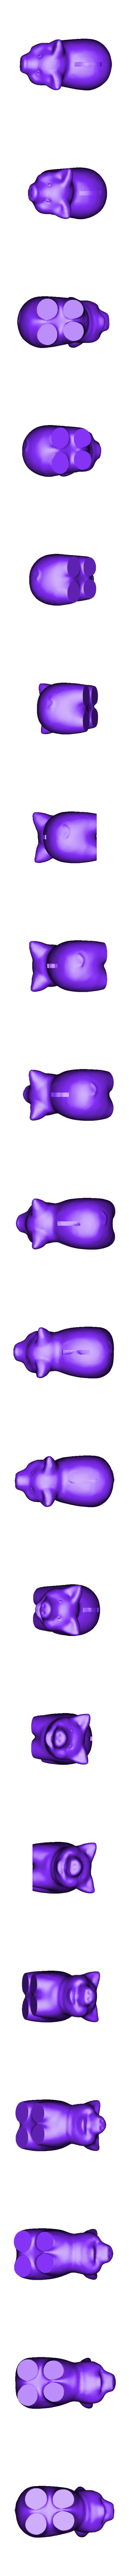 PiggyBank.stl Download free STL file Piggy Bank (Edited 3D Scan) • 3D print model, 3DWP